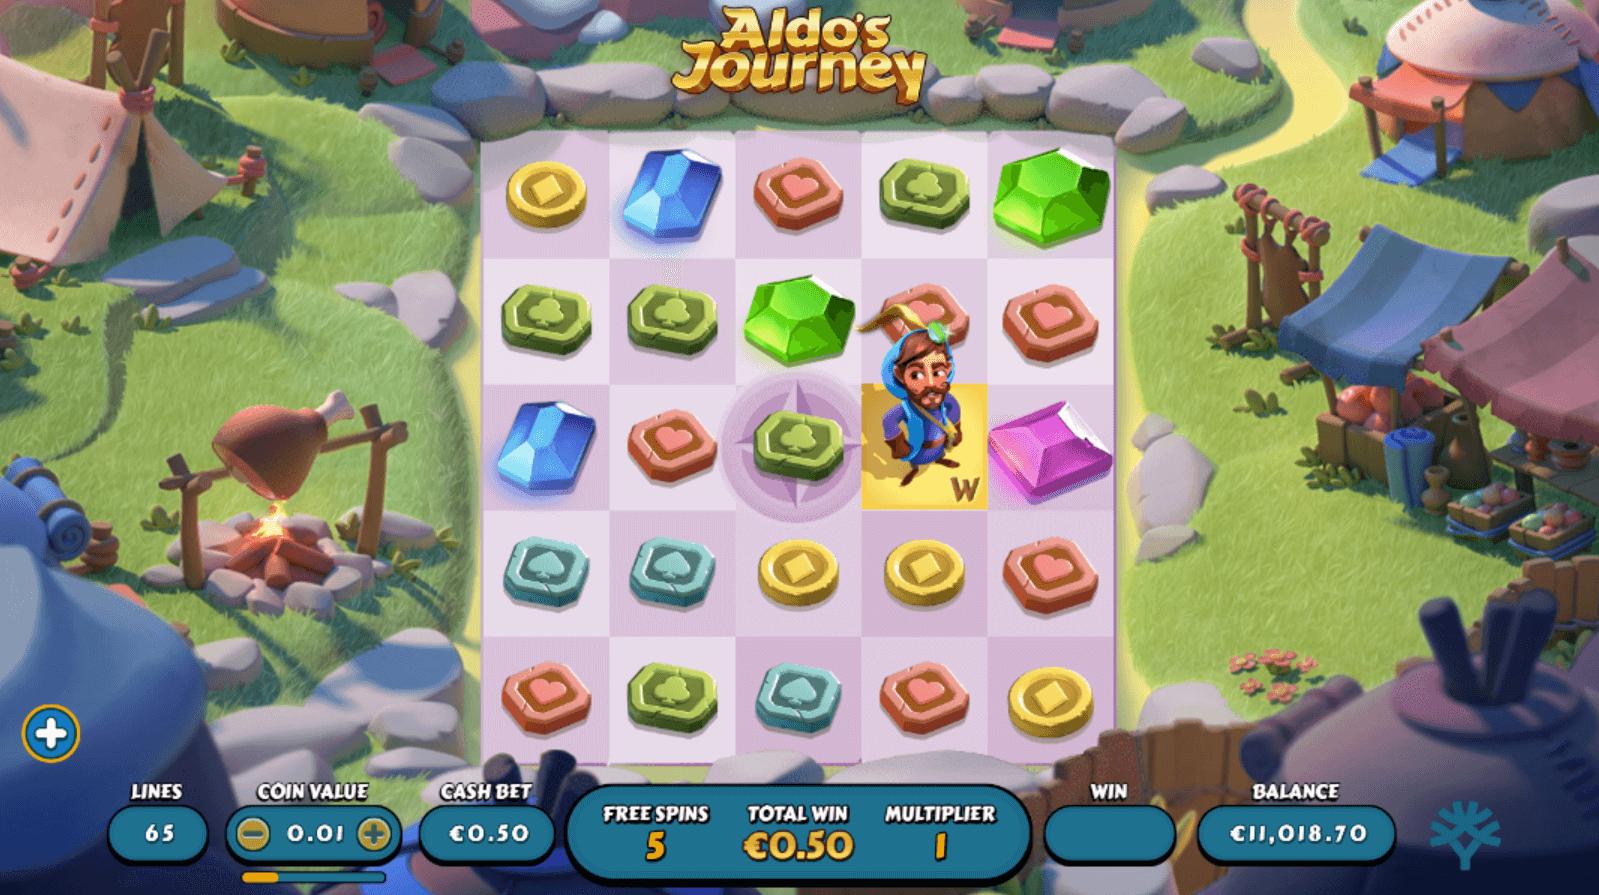 Aldo Journey